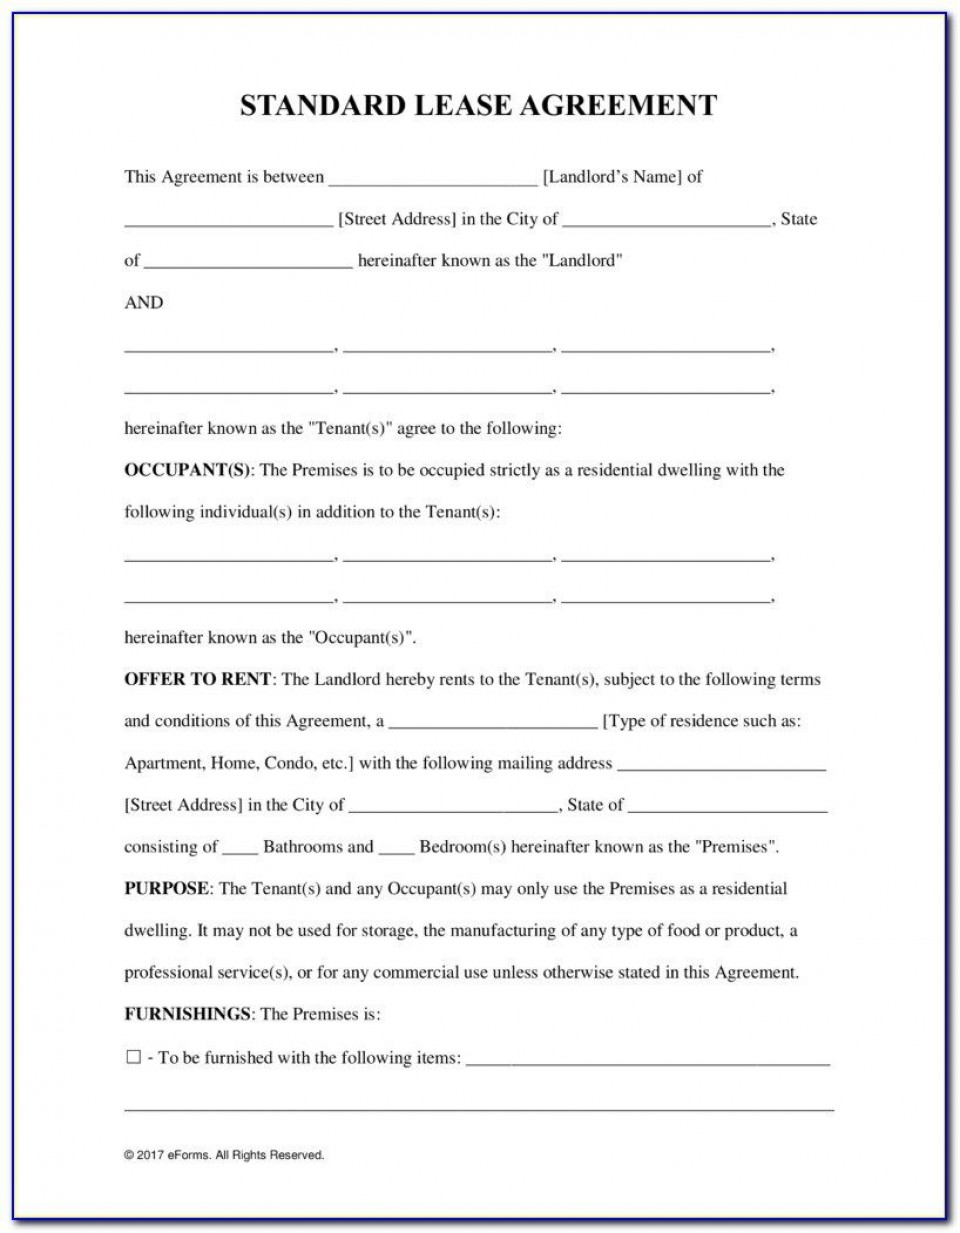 009 Impressive Tenancy Agreement Template Word Free Example  Uk 2020 Rental Doc Lease960